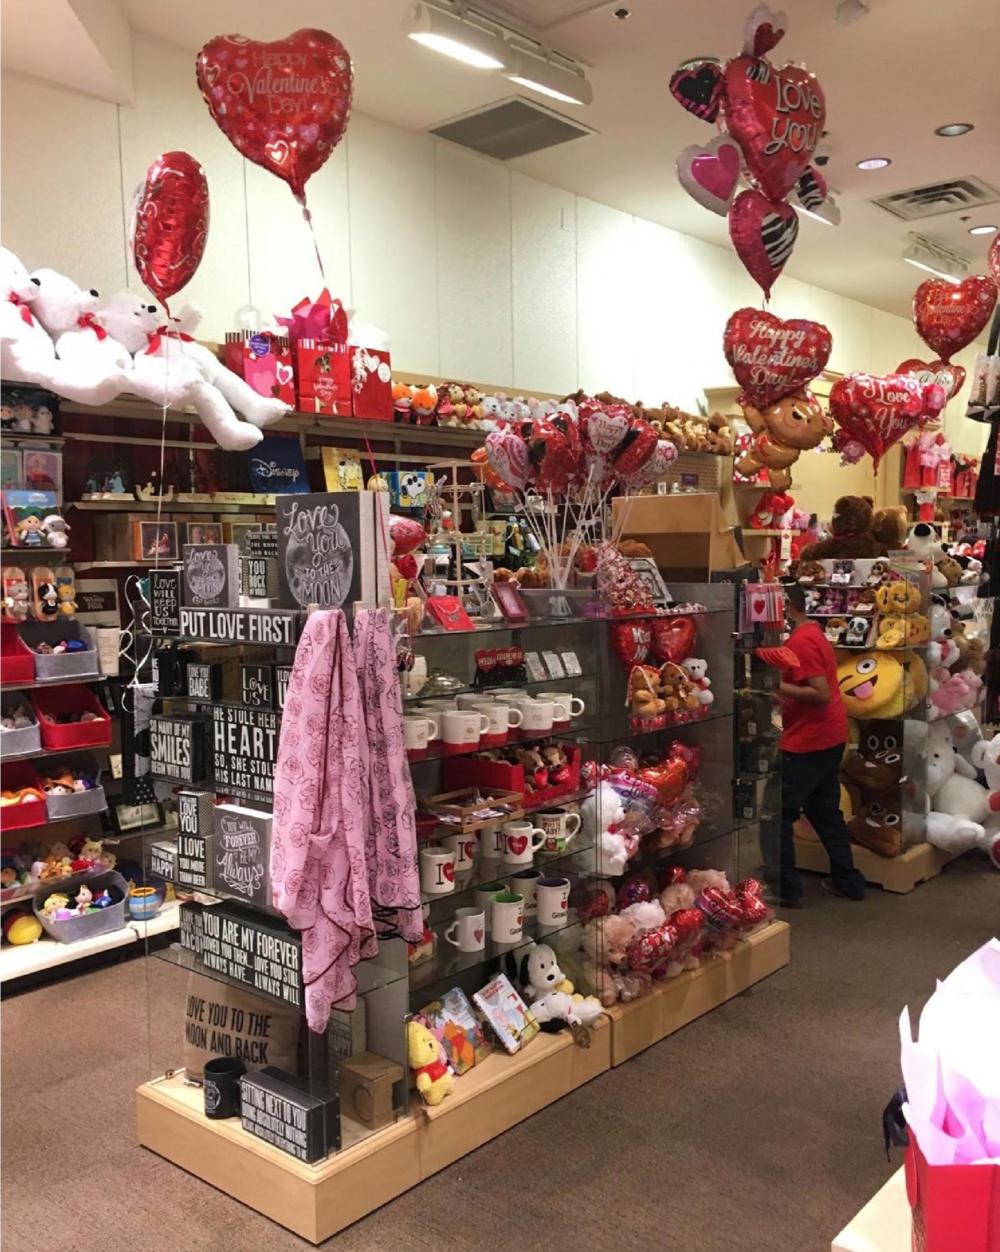 Valentinesday-page-002.jpg